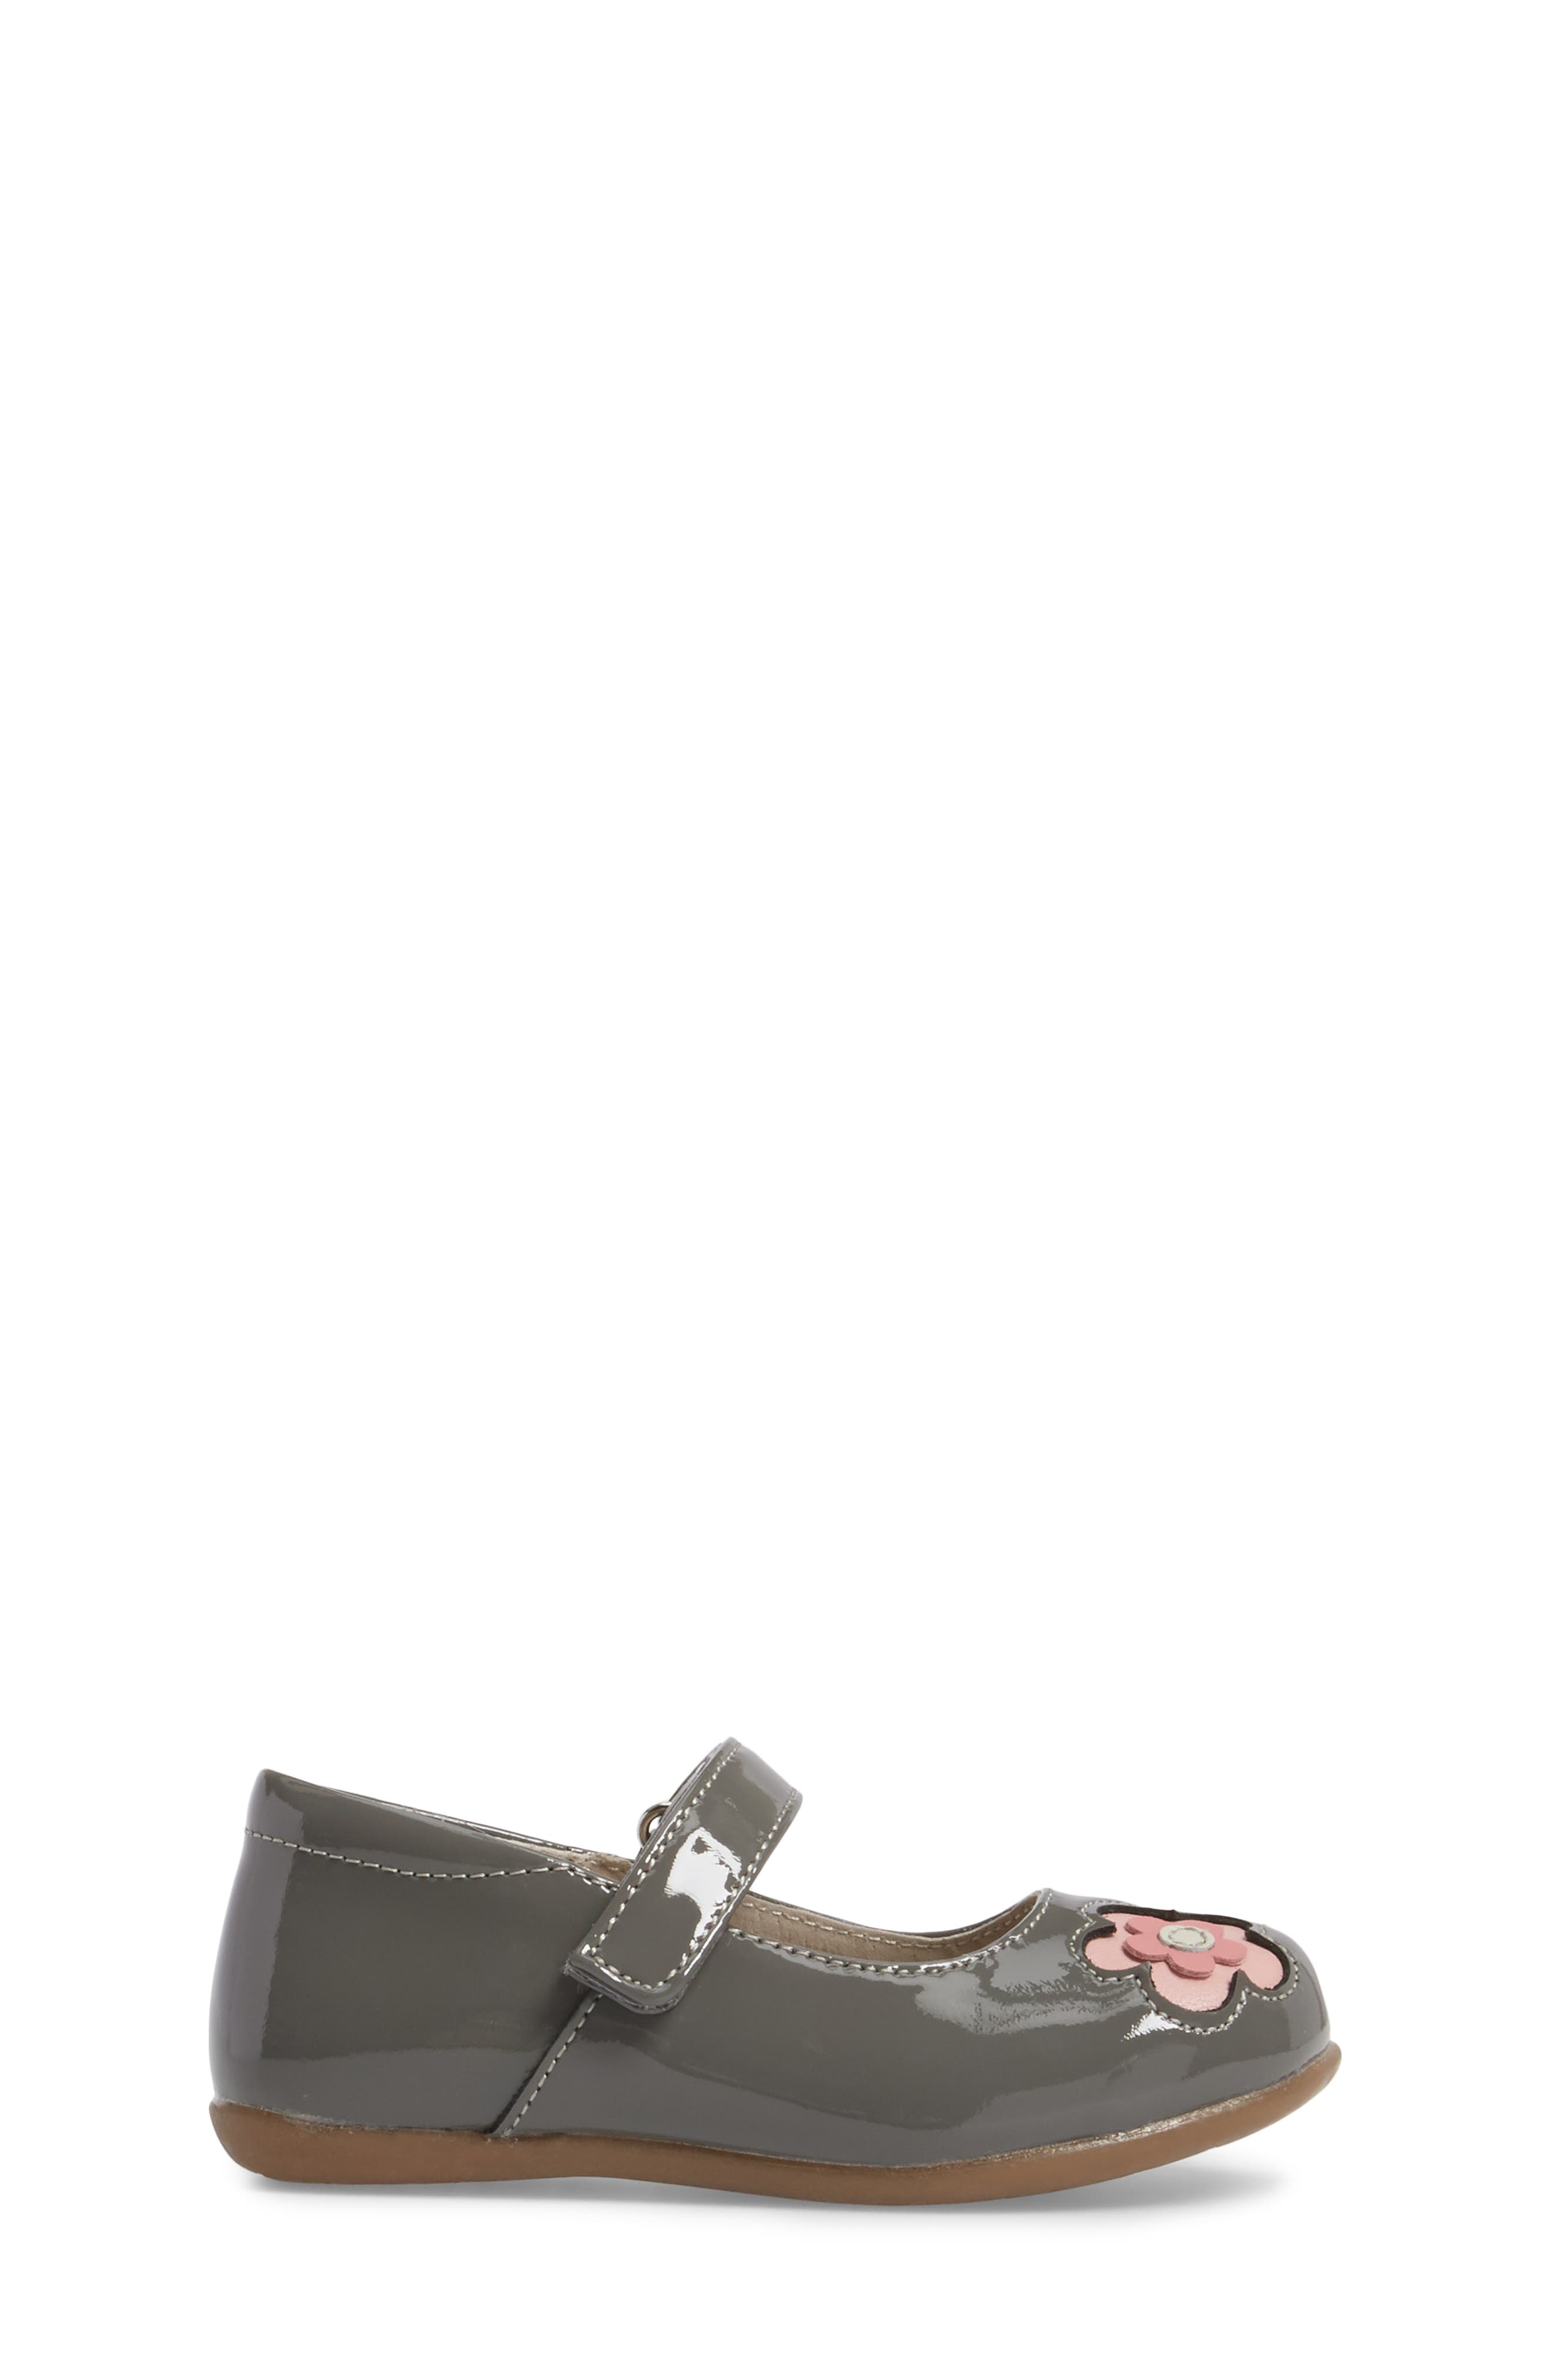 Stella Mary Jane Flat,                             Alternate thumbnail 3, color,                             Grey Patent